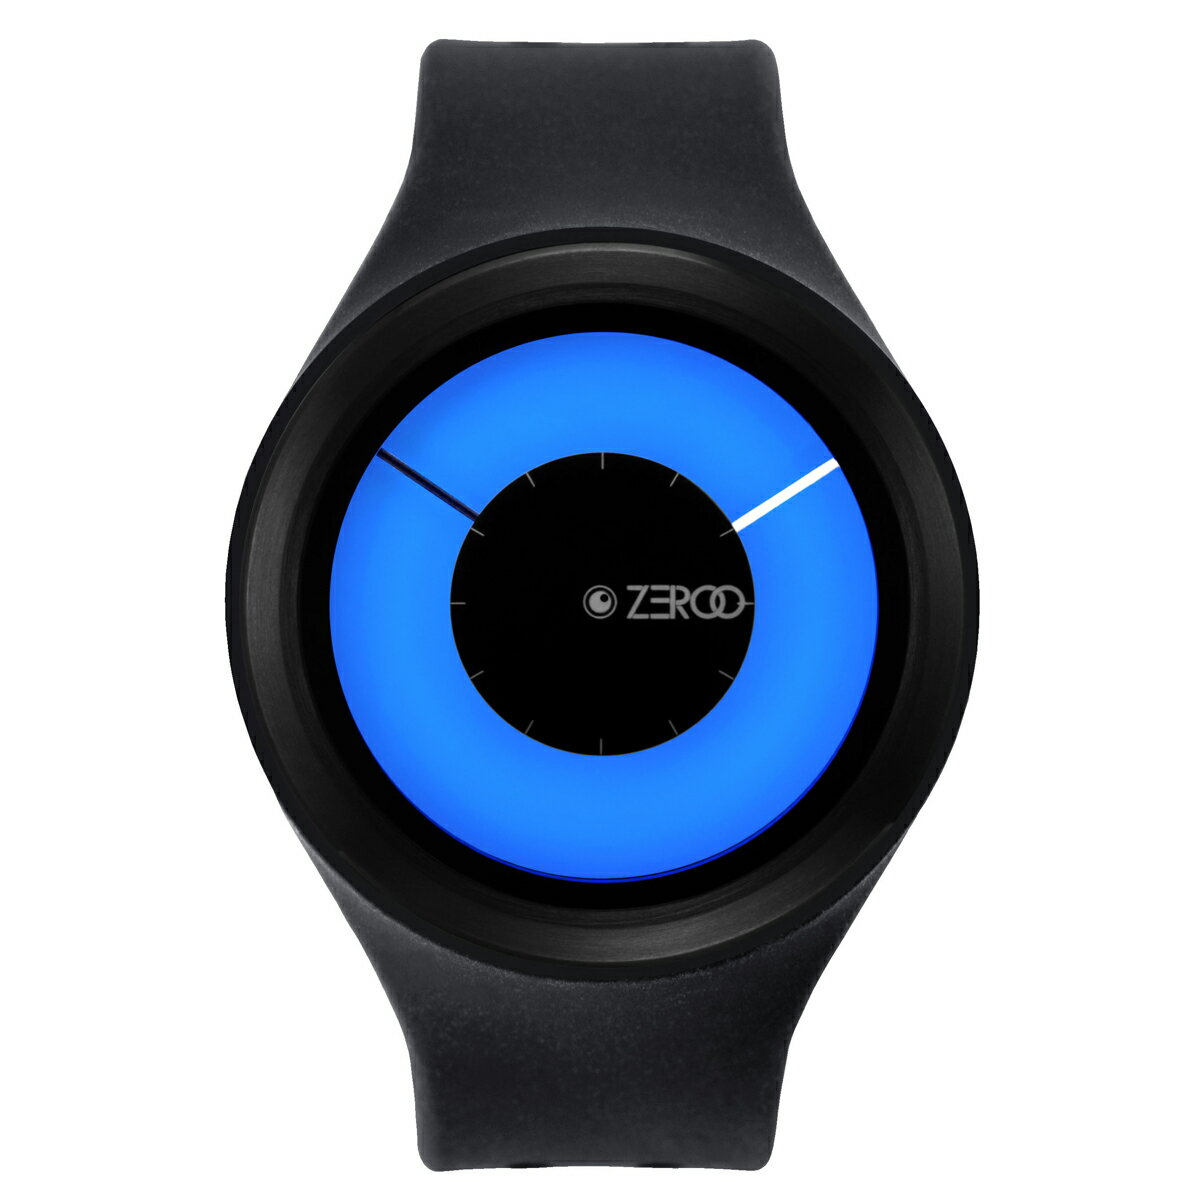 ZEROO MAGIA AURORA ゼロ 電池式クォーツ 腕時計 [W00802B03SR02] ブラック デザインウォッチ ペア用 メンズ レディース ユニセックス おしゃれ時計 デザイナーズ